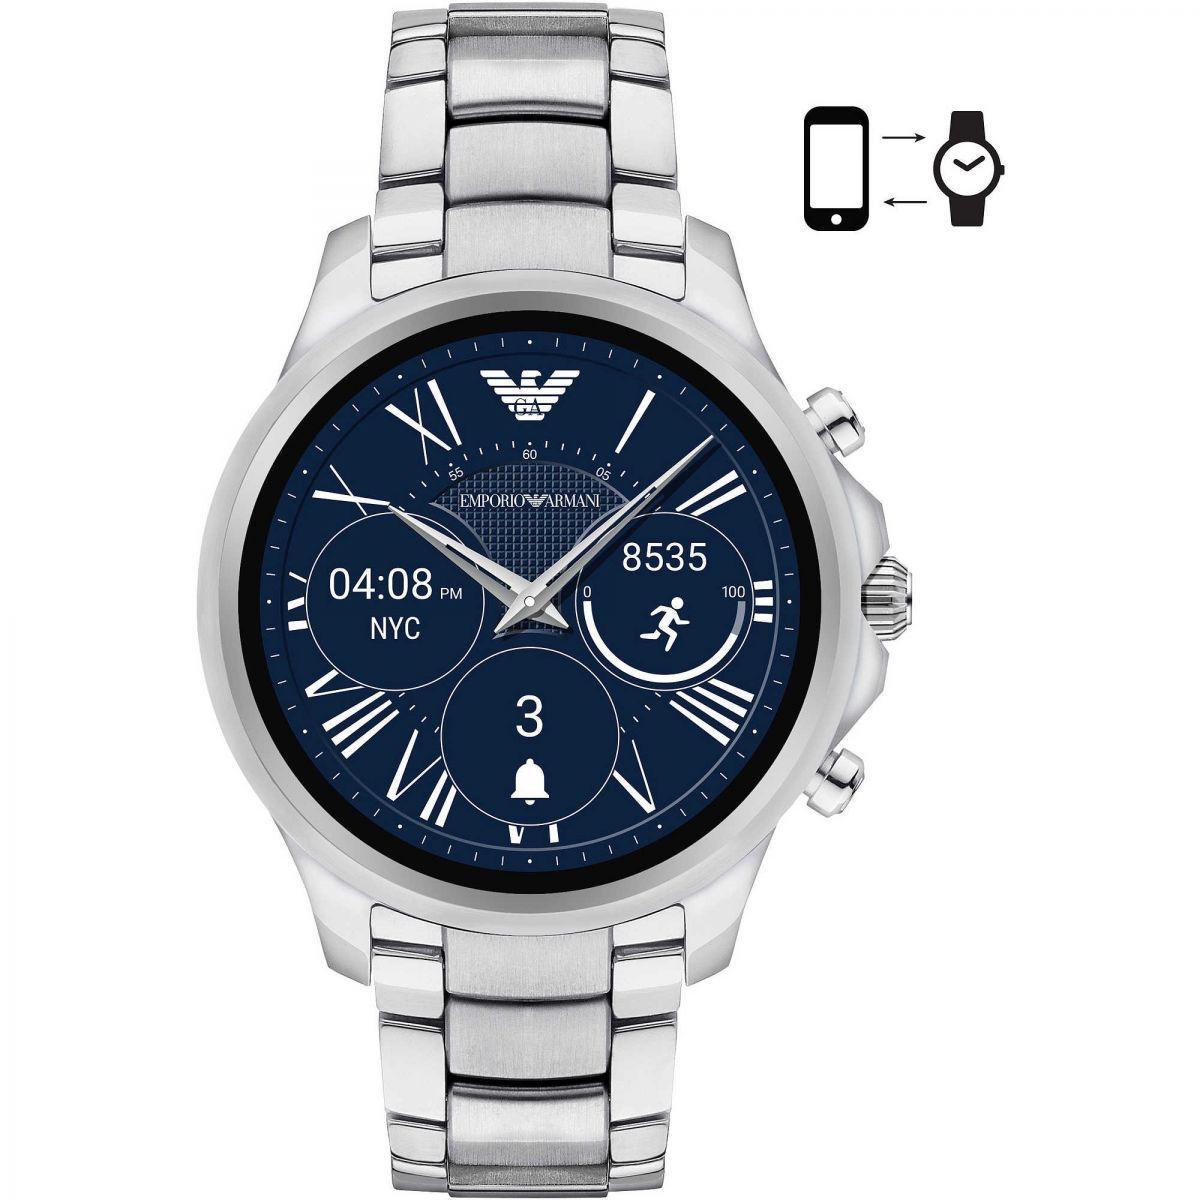 Orologio Smartwatch Emporio Armani Connected ART5000 in Acciaio